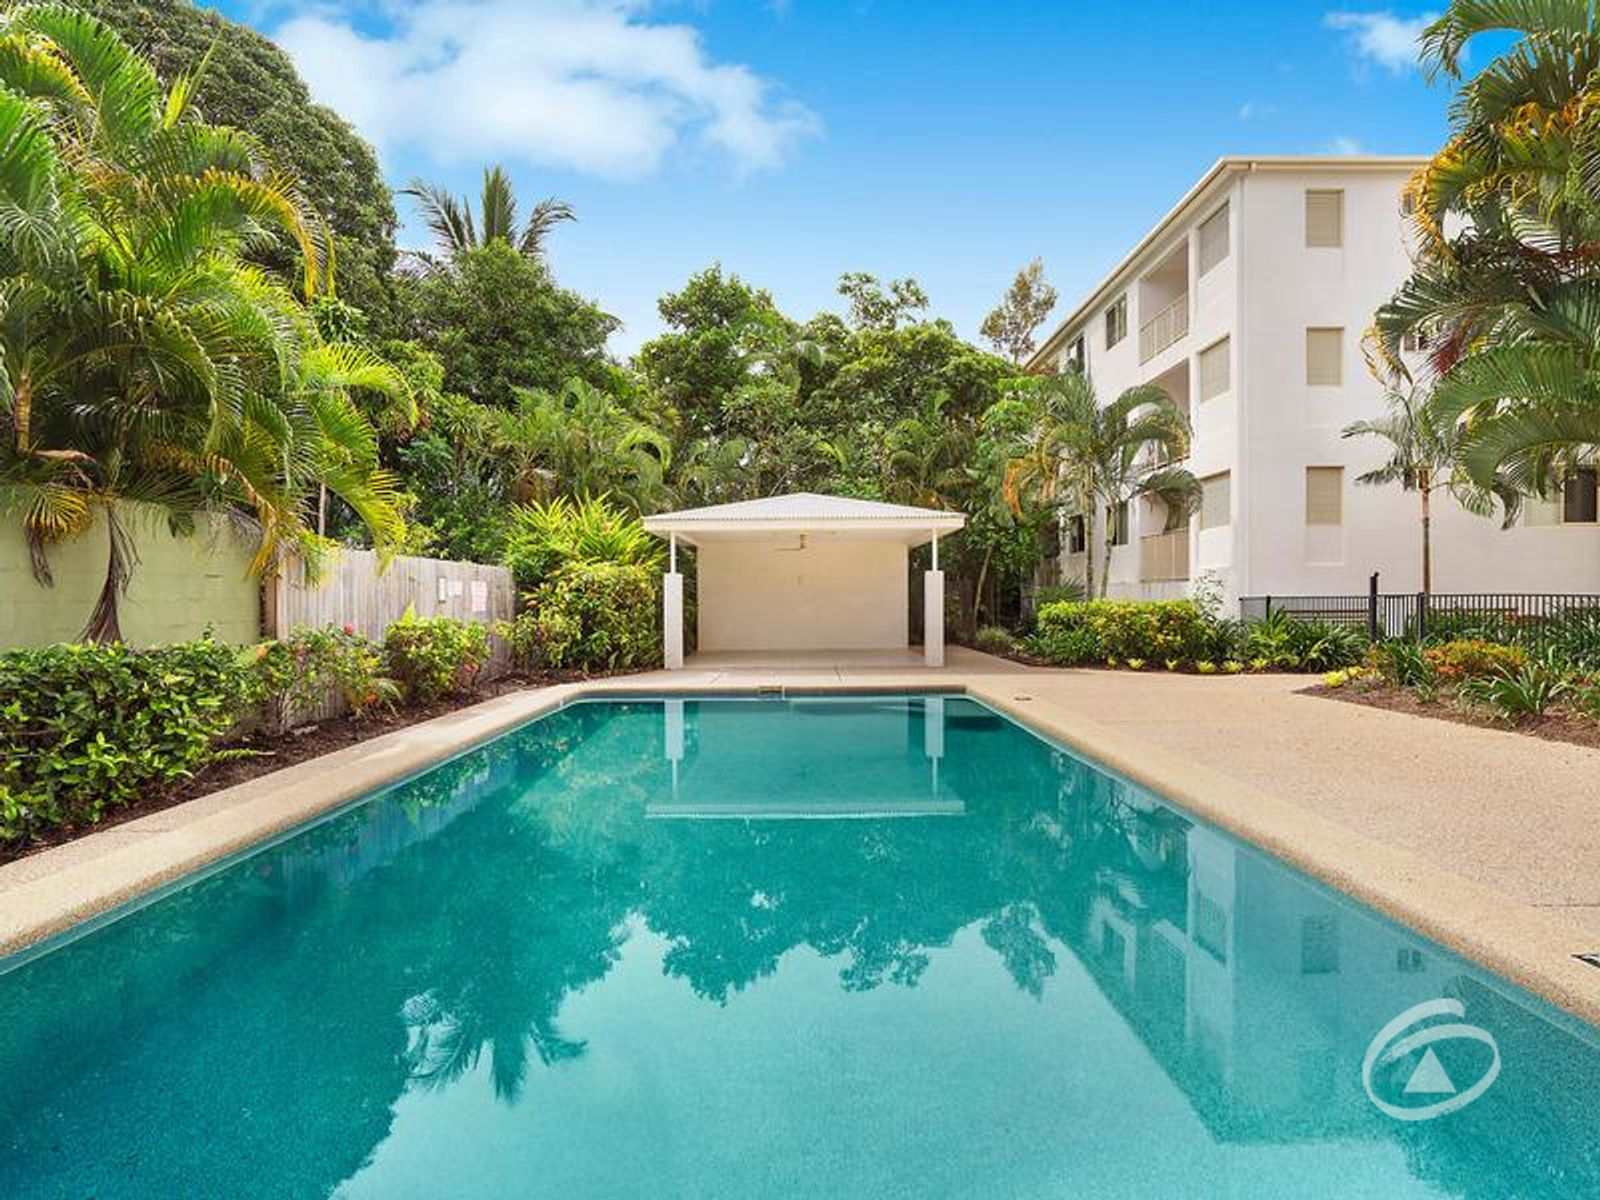 5A/210 Grafton Street, Cairns North, QLD 4870